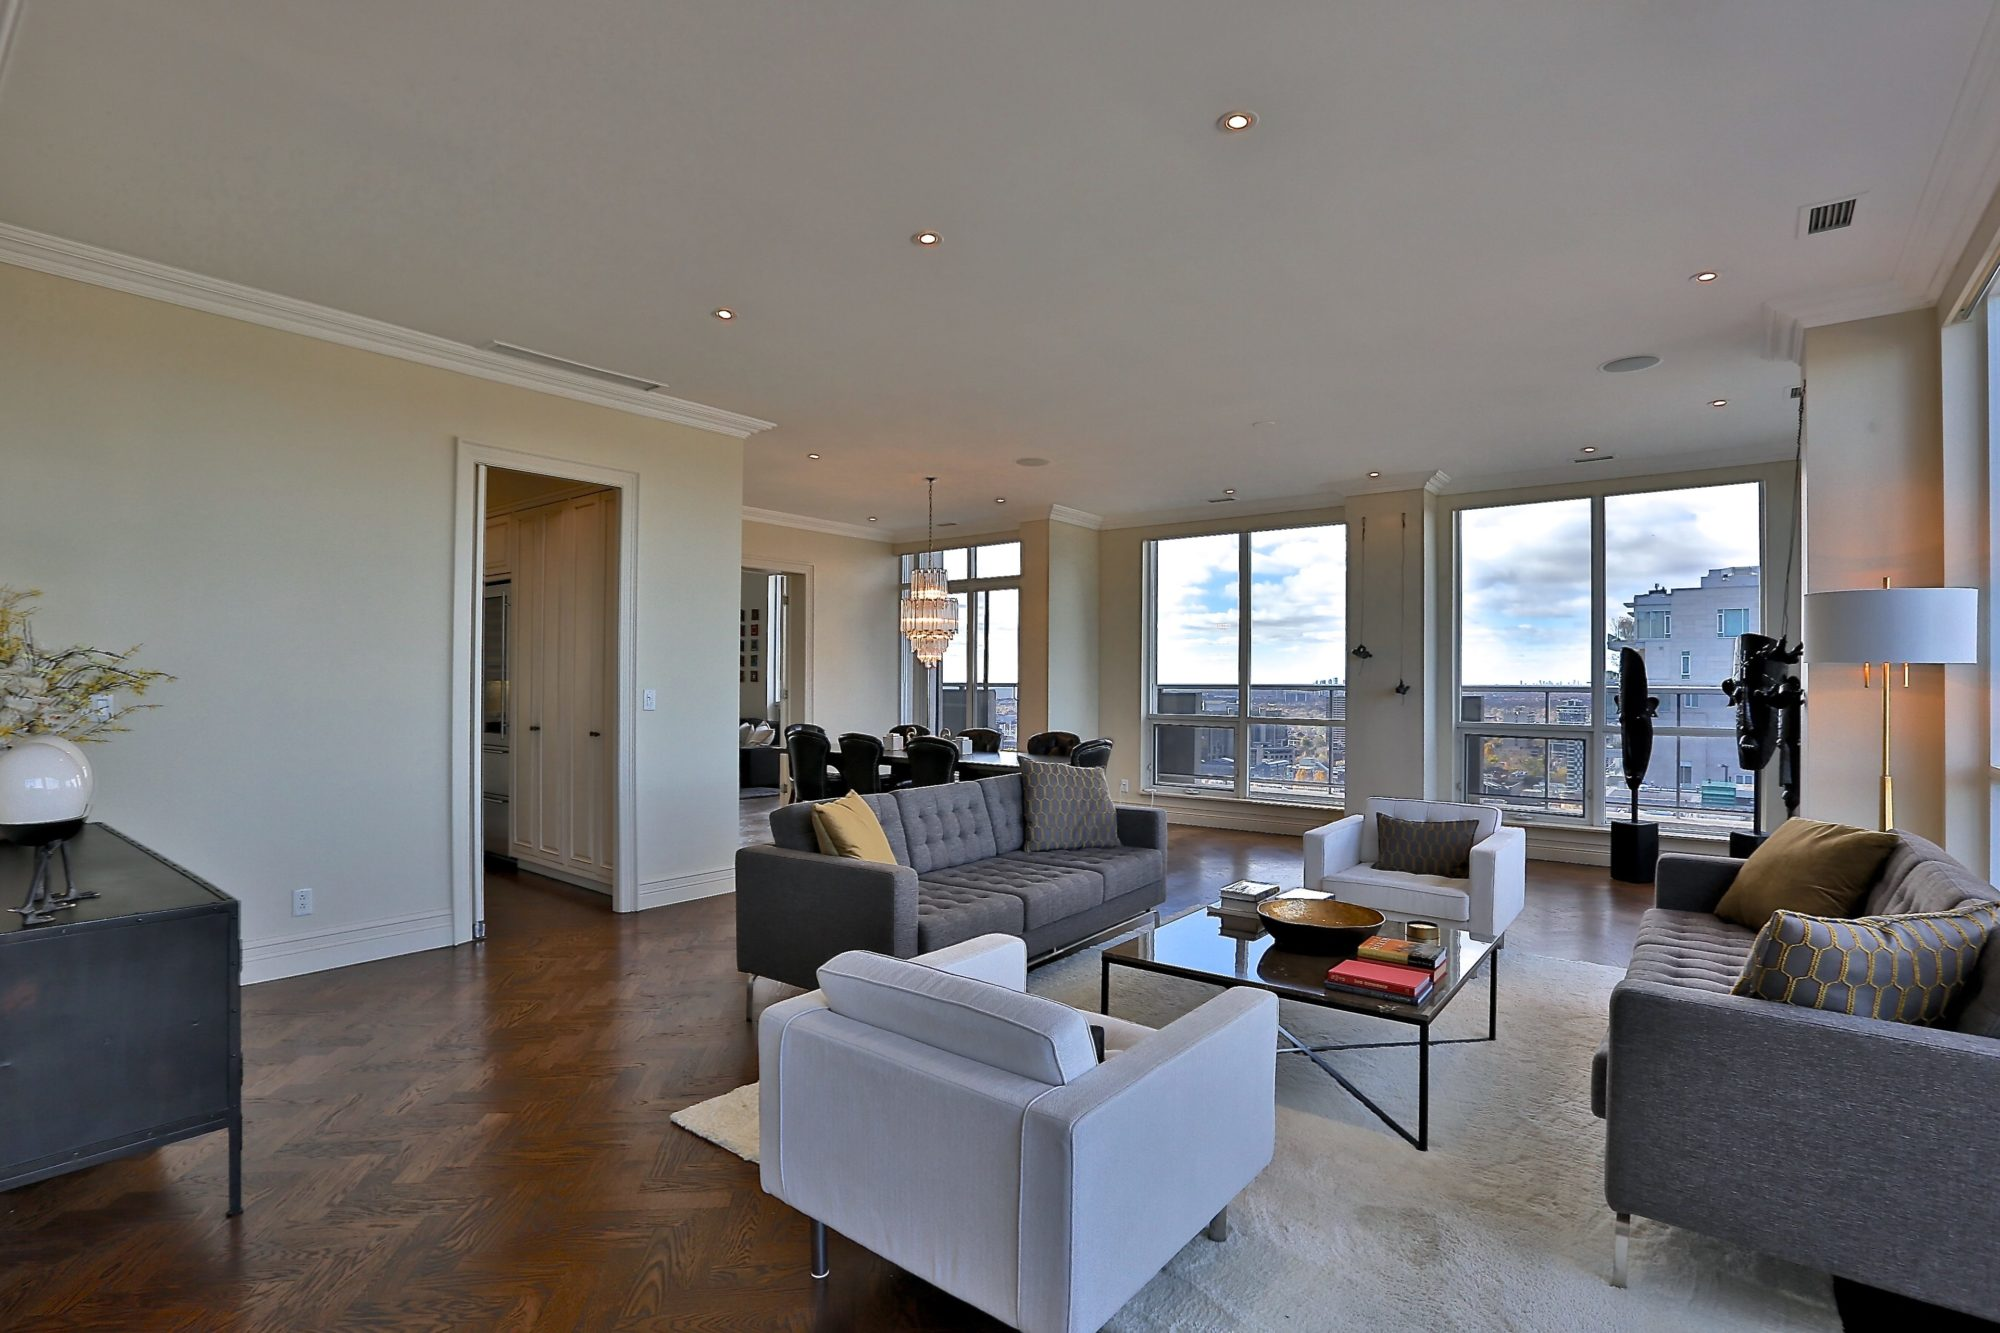 toronto-condo-for-rent-10-bellair-street-3